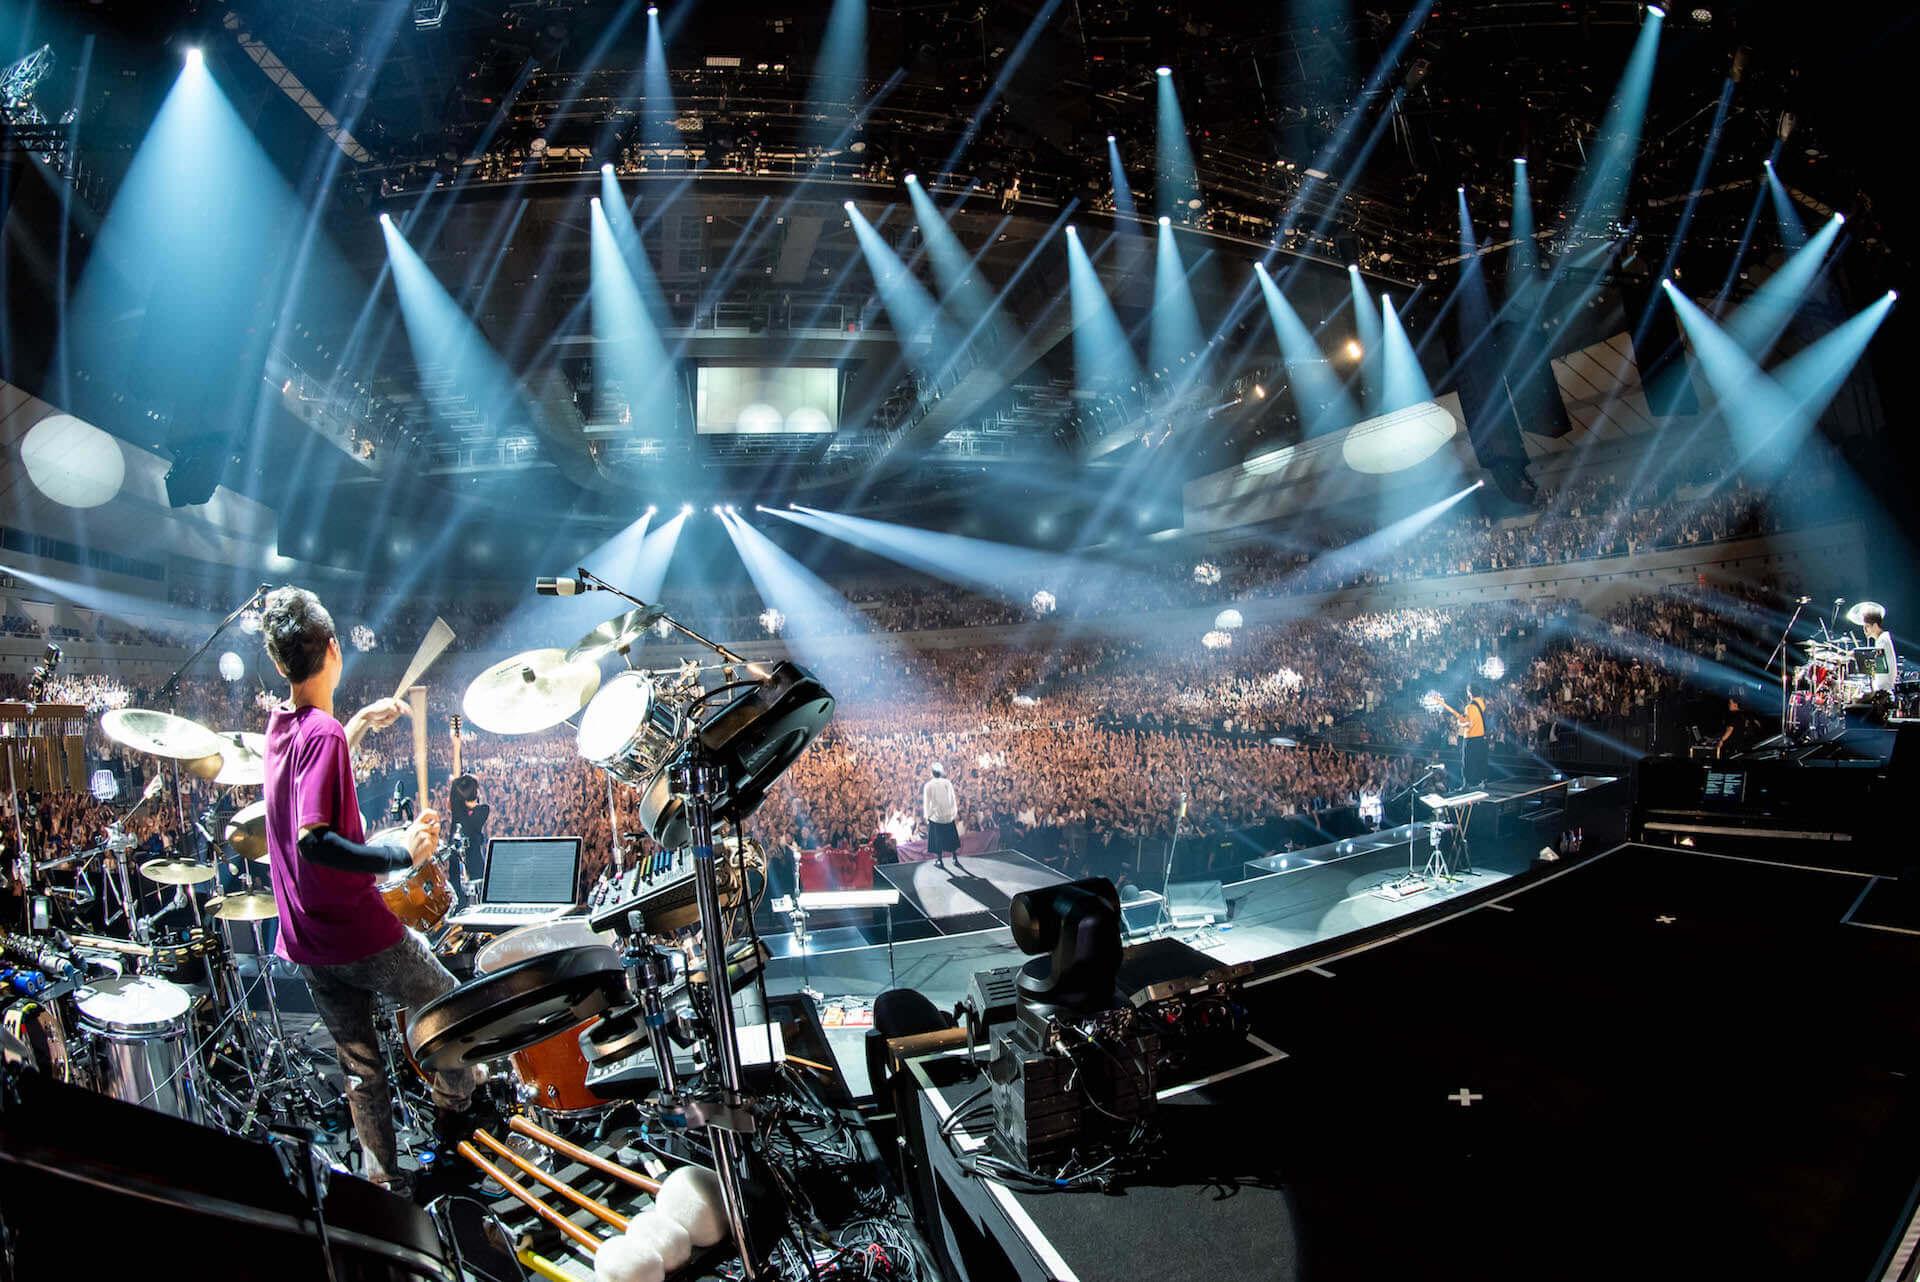 RADWIMPS横浜アリーナ公演のライブ写真が公開!<ANTI ANTI GENERATION TOUR 2019>レポート music190830_radwimps_live_1-1920x1282